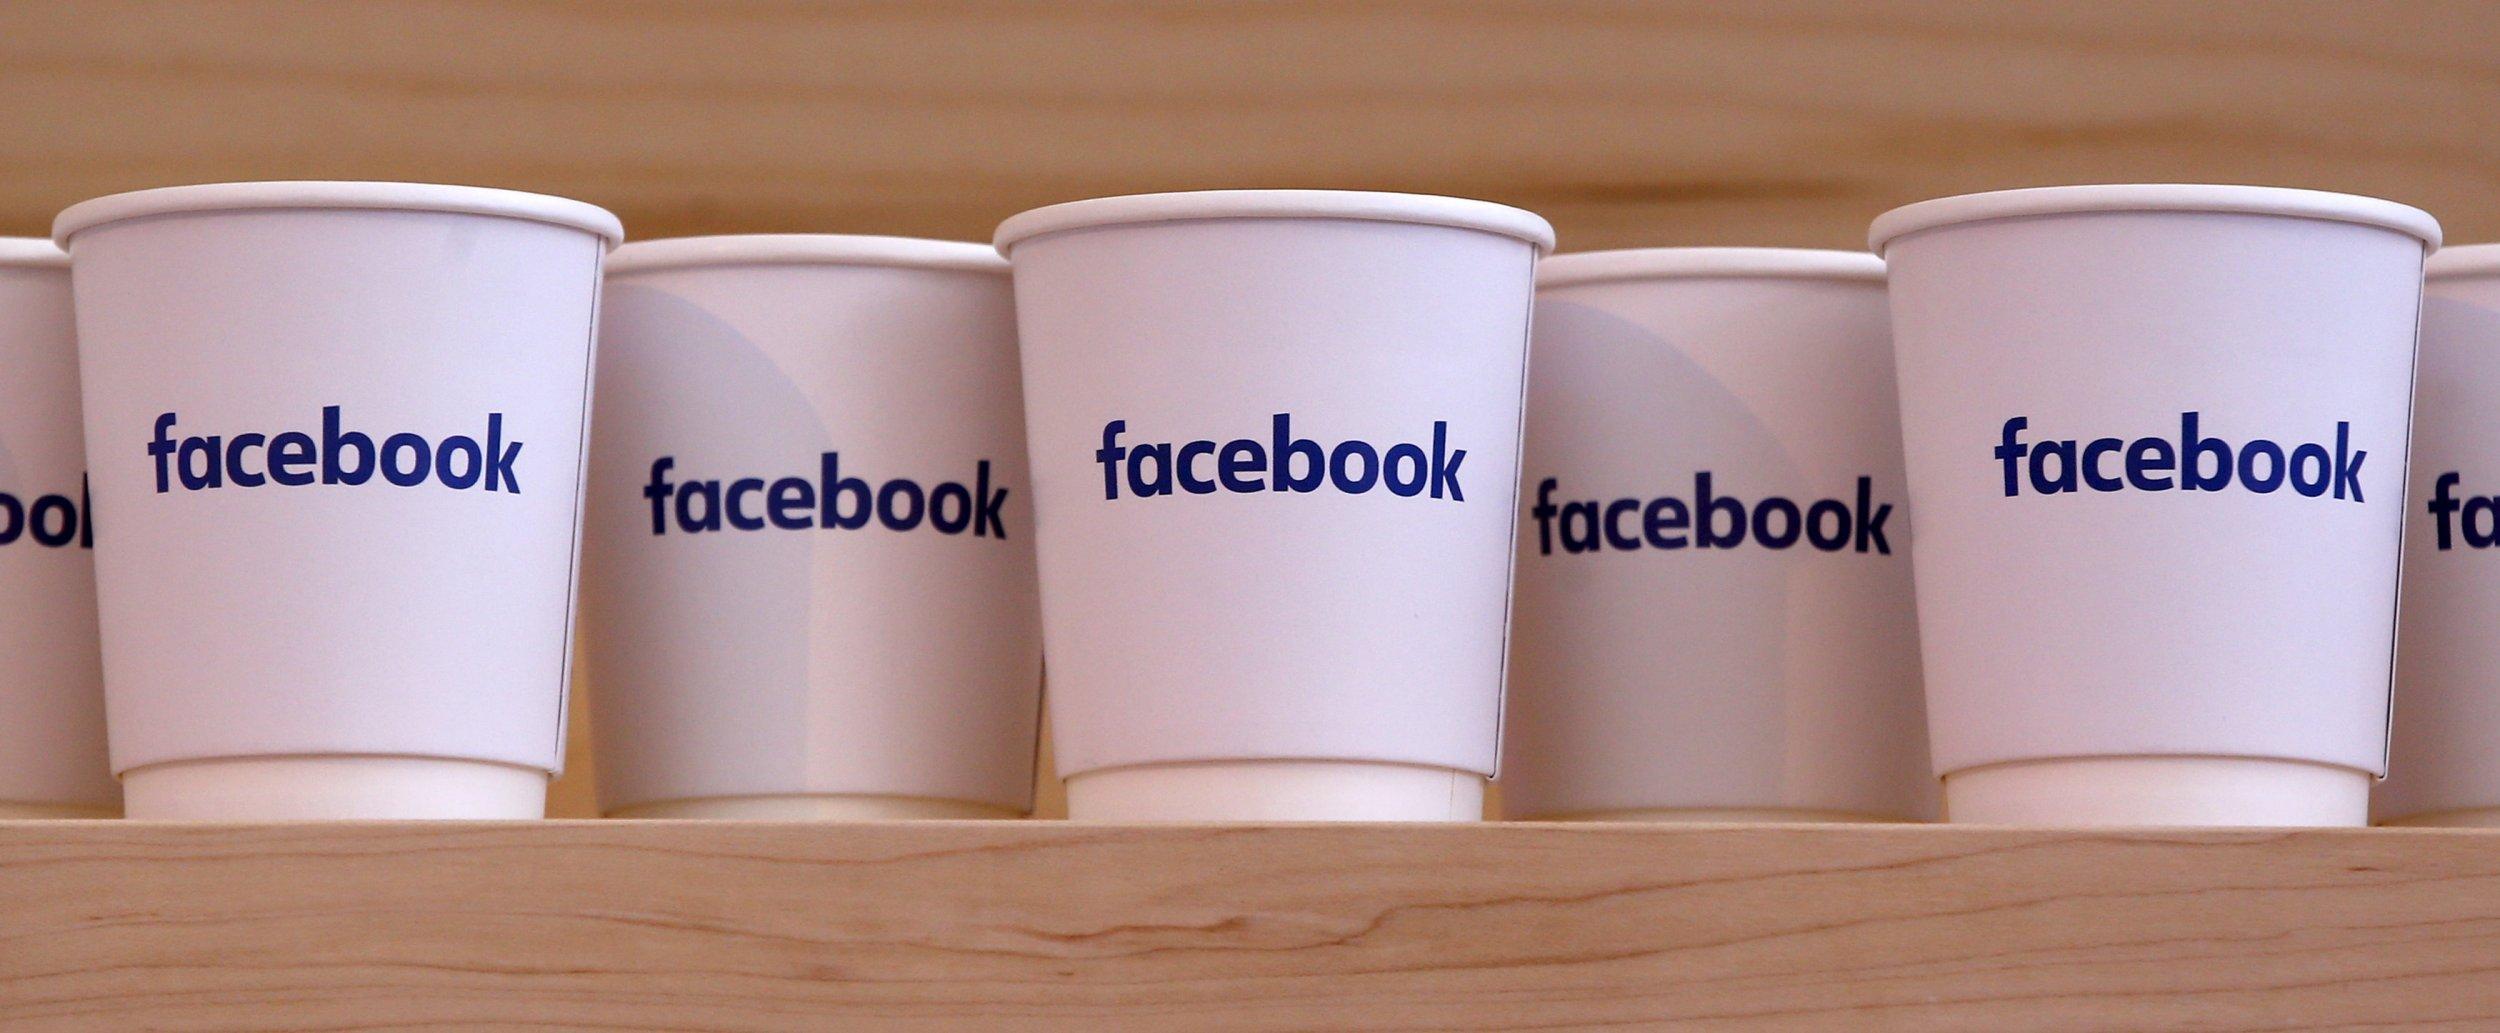 Facebookmarchandizing